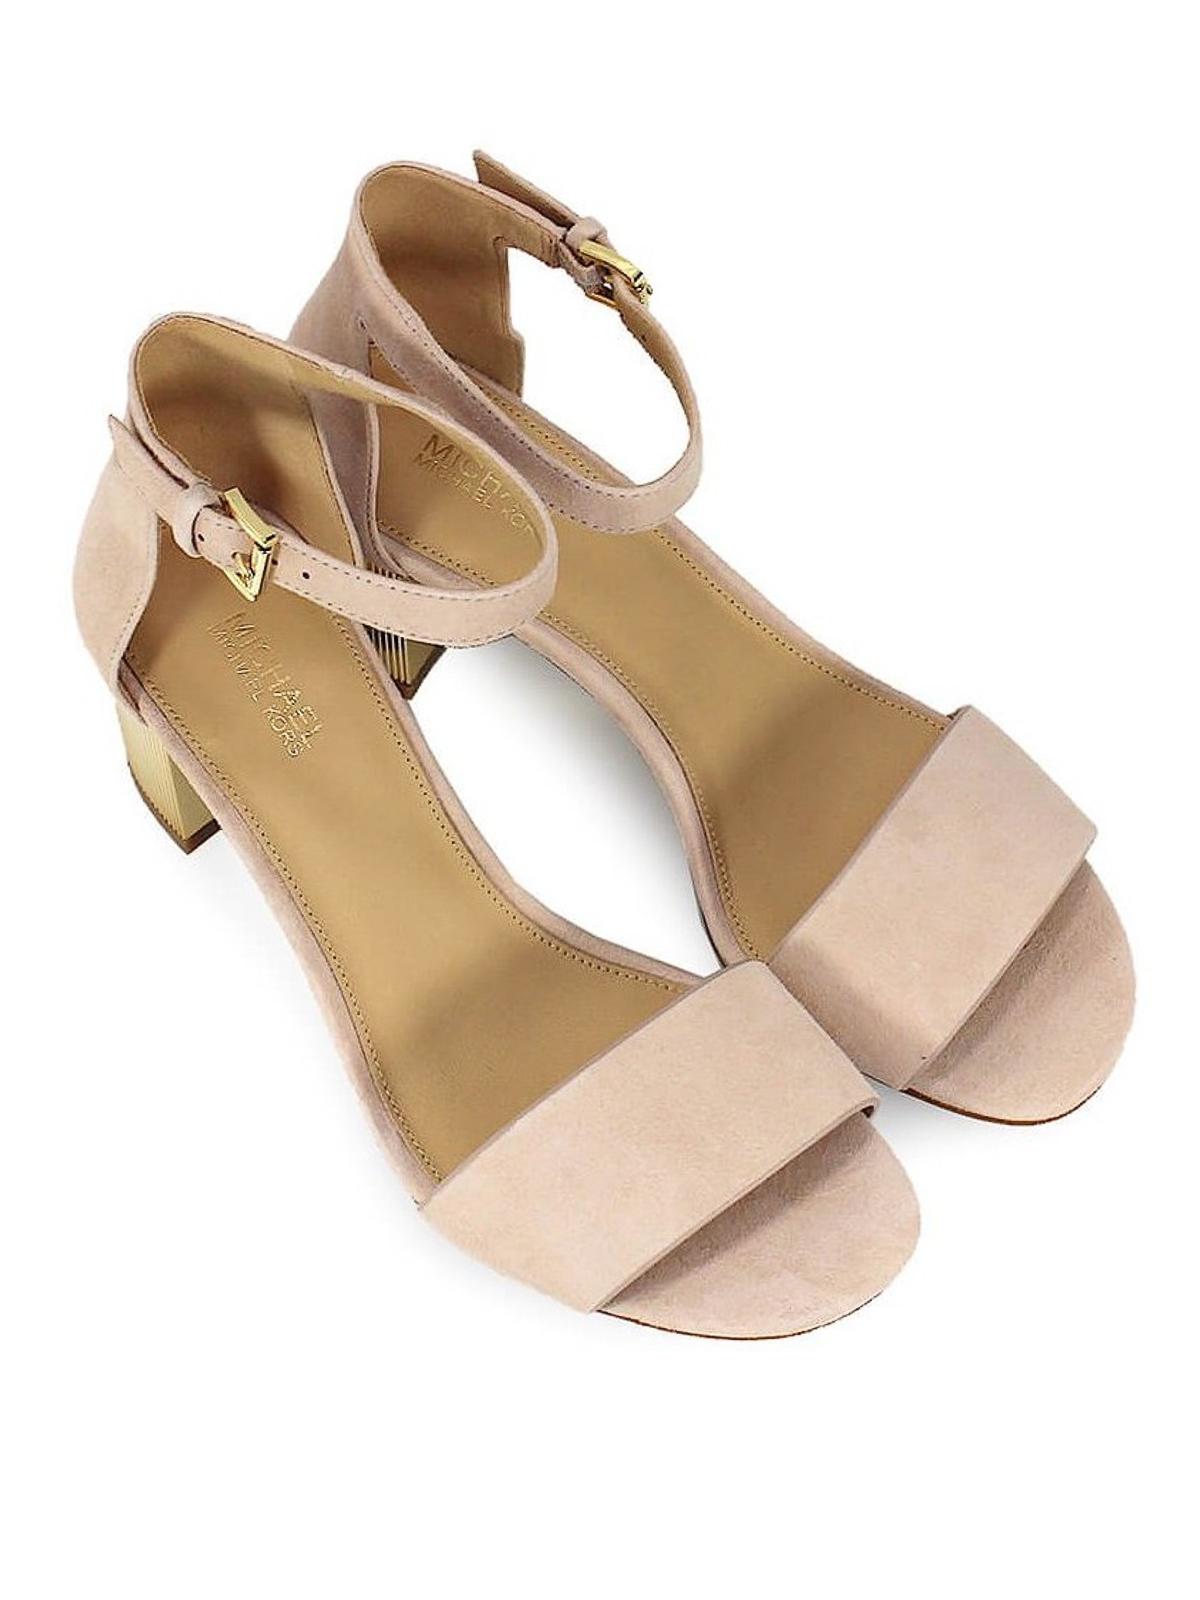 Michael Kors - Paloma suede sandals